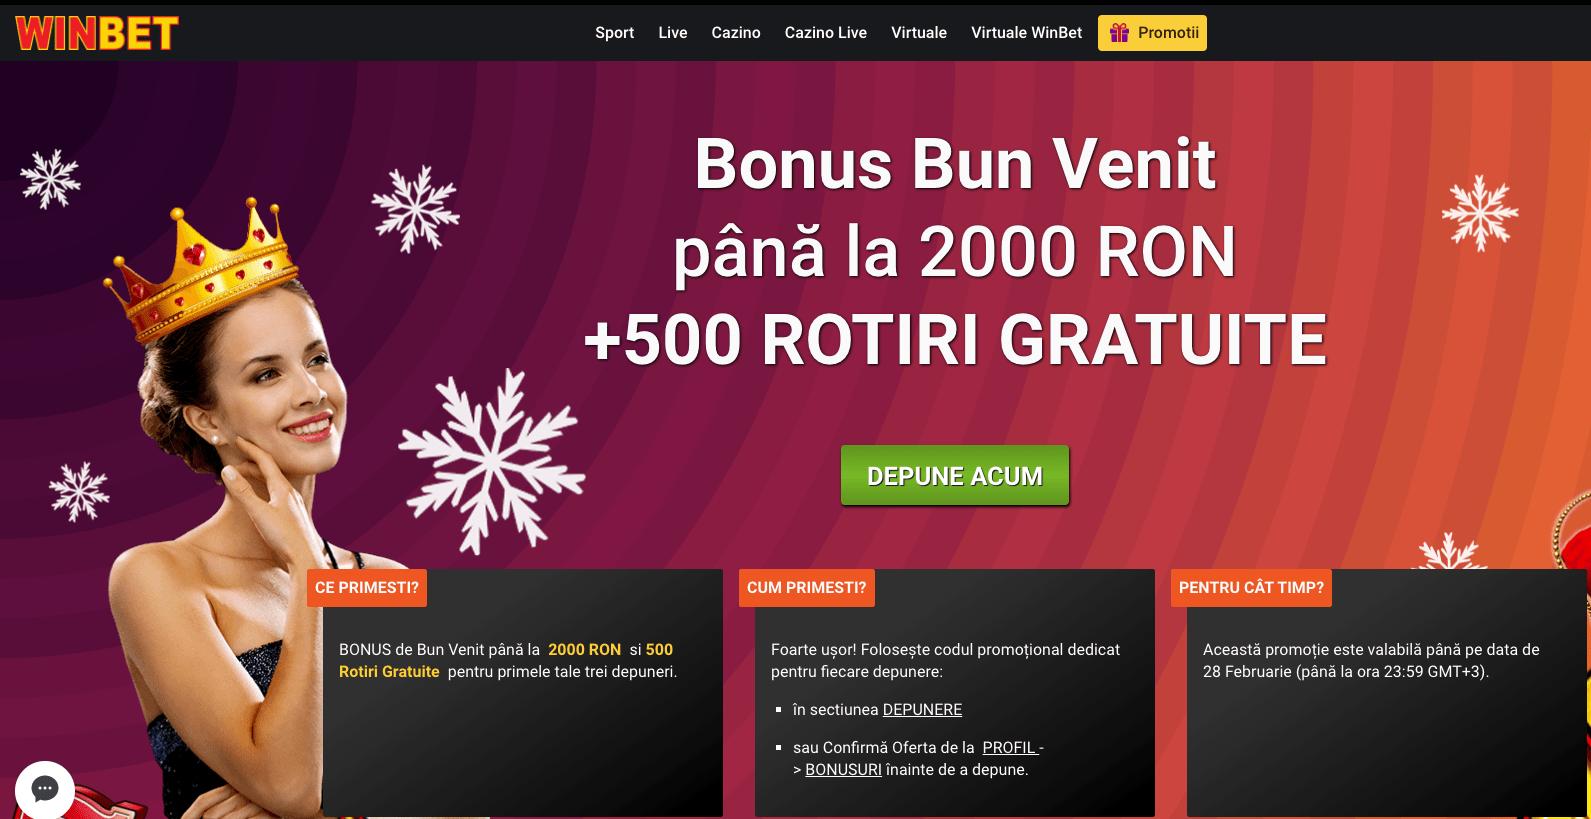 Winbet Bonus Bun Venit